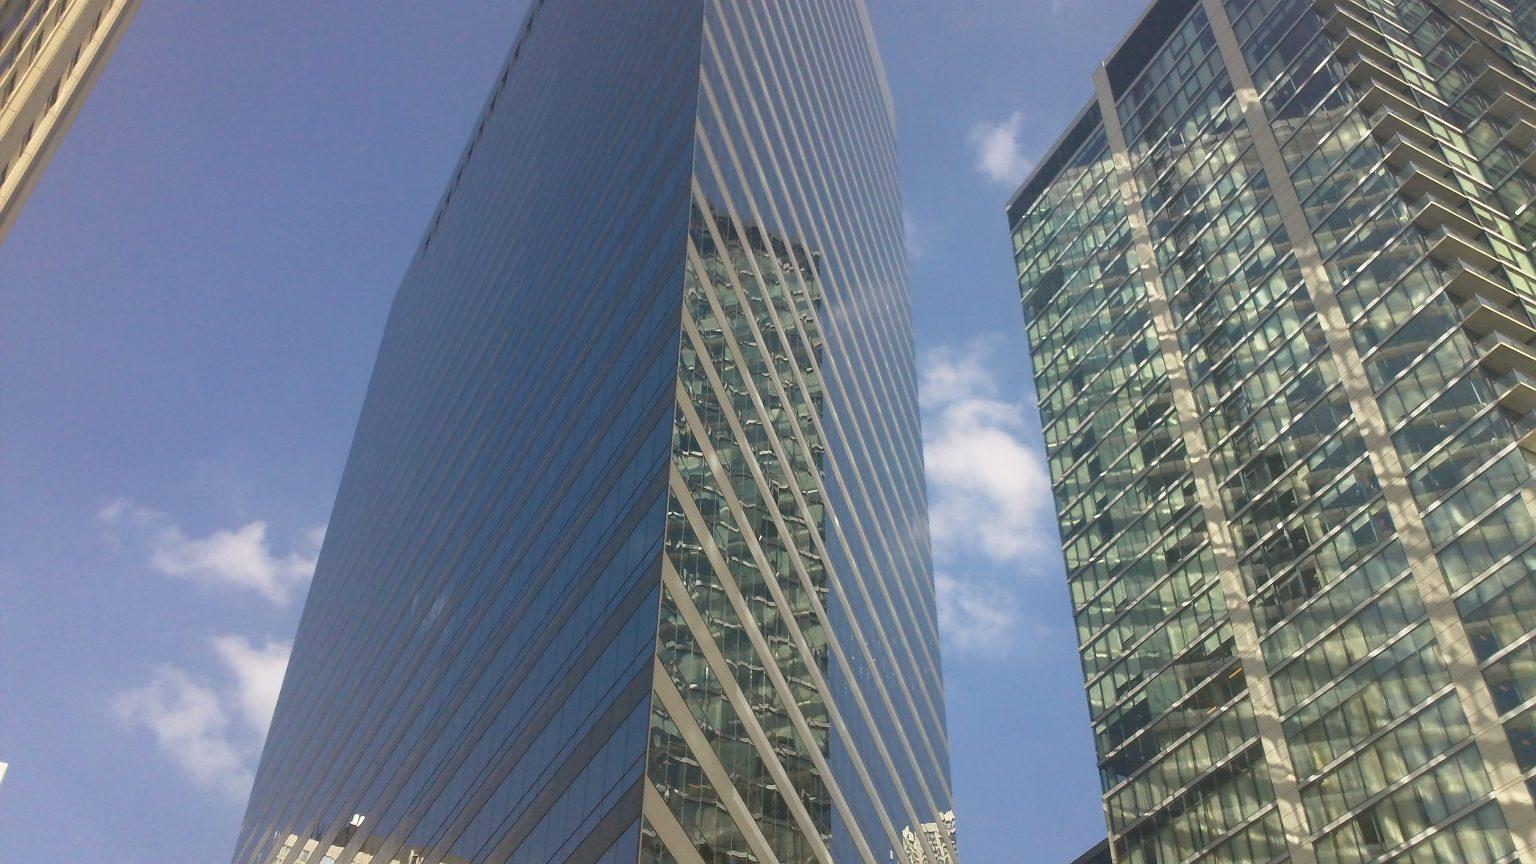 A sharply-cornered skyscraper